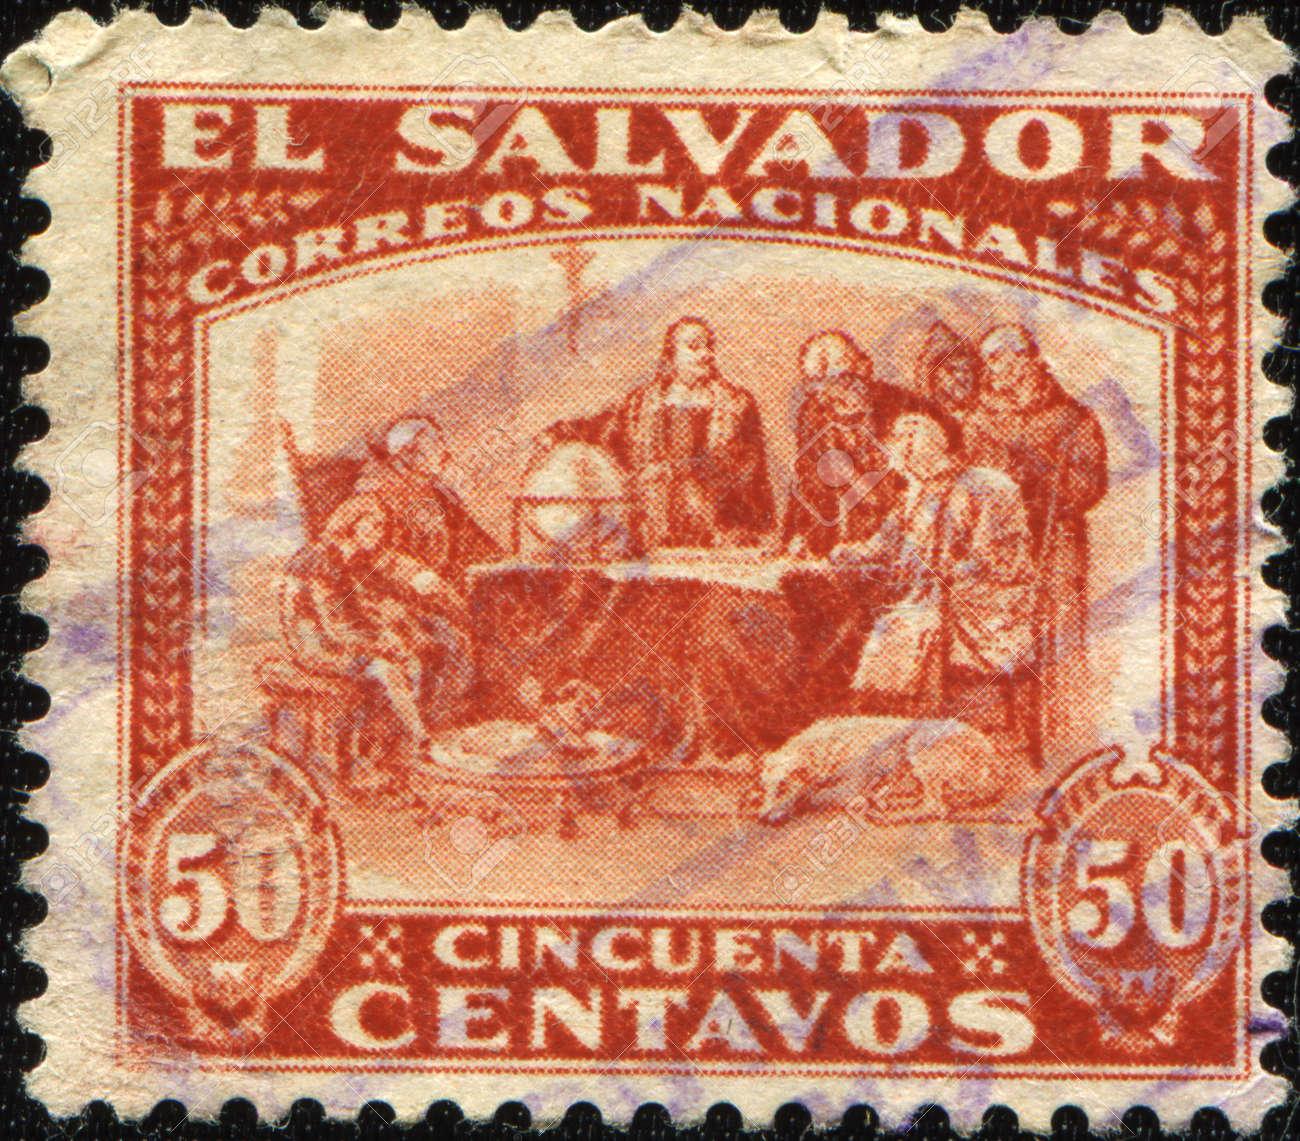 SALVADOR - CIRCA 1892: A stamp printed in Salvador shows draw by Izquierdo